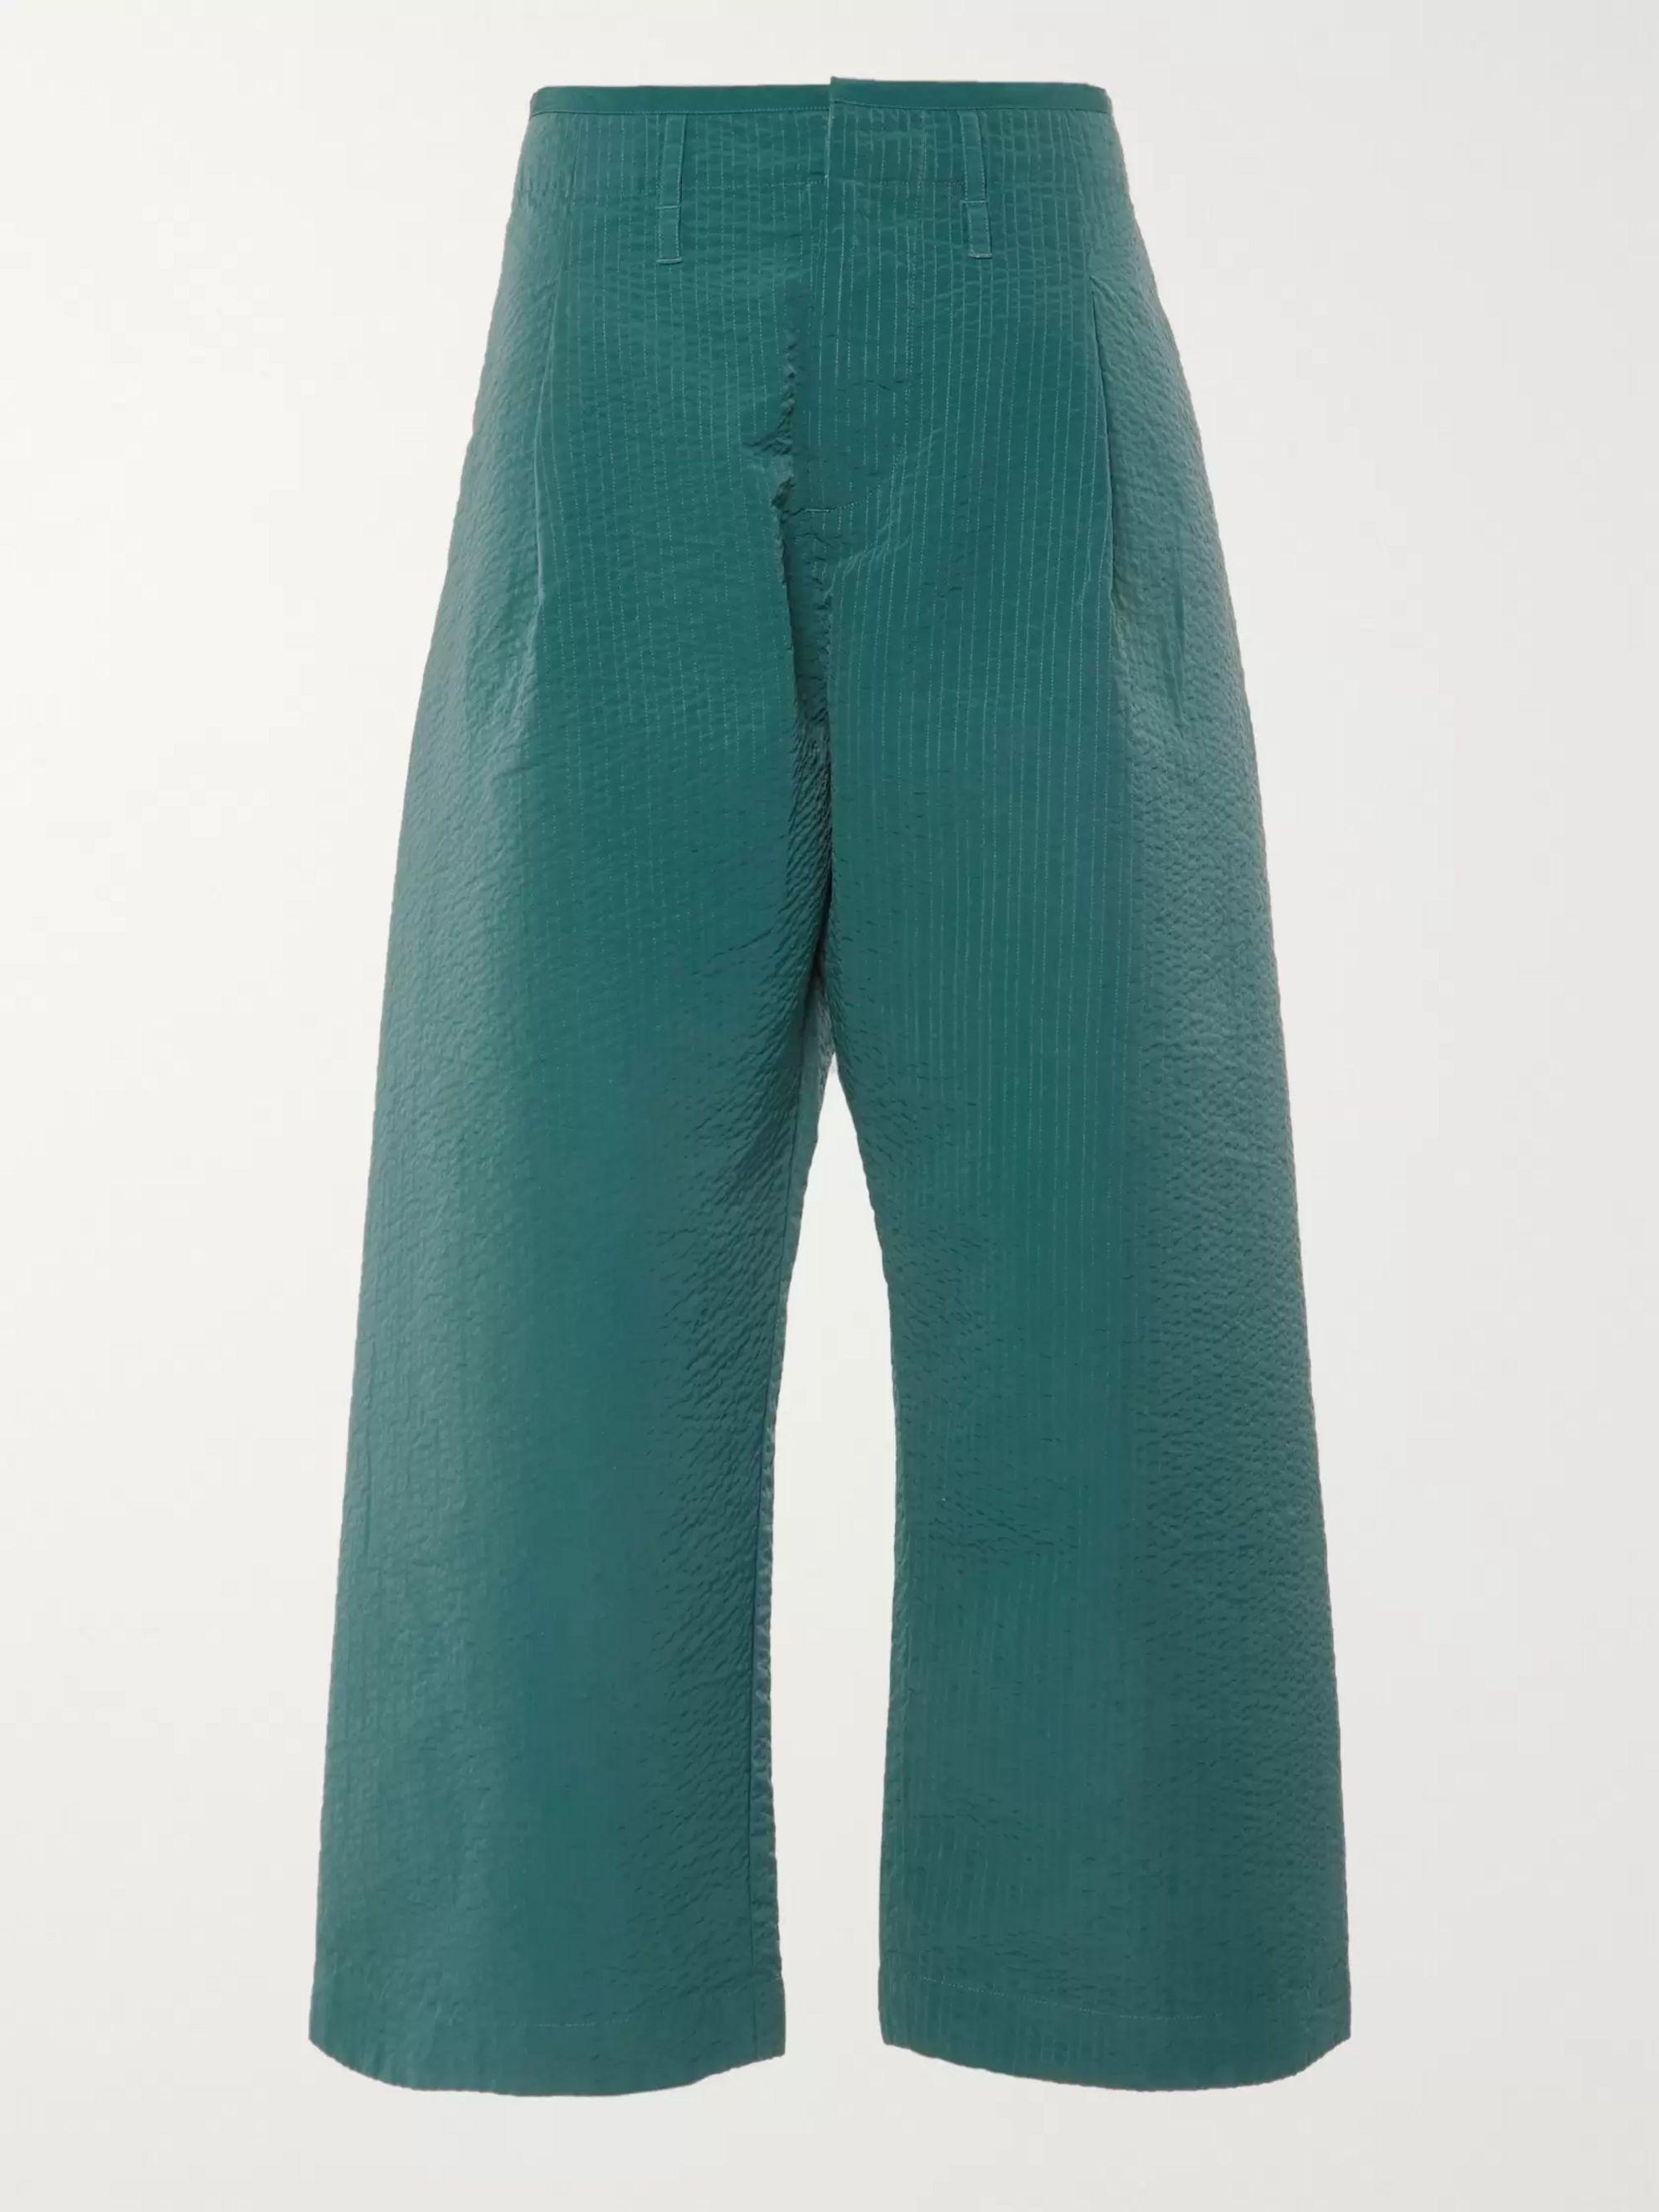 Cropped Wide Leg Seersucker Trousers by Craig Green